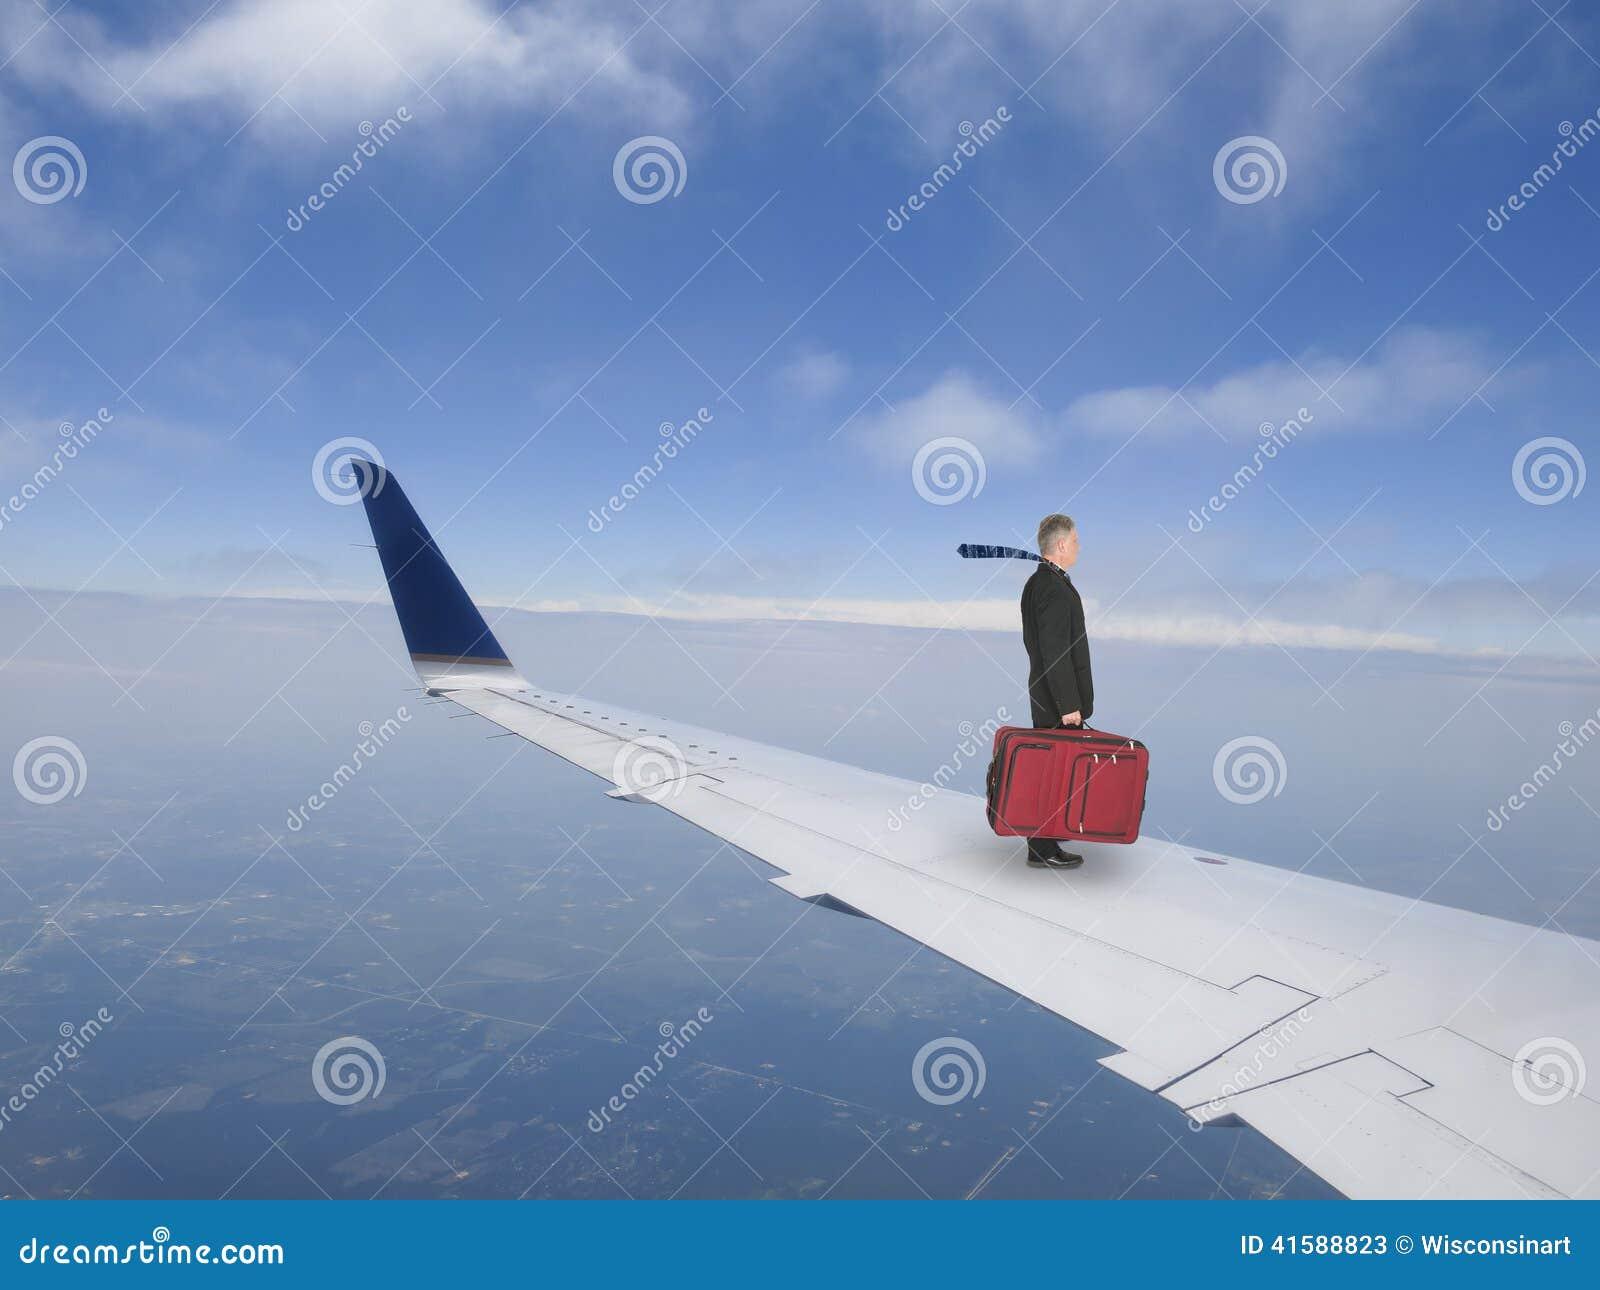 Business Travel Concept, Businessman Flying on Jet